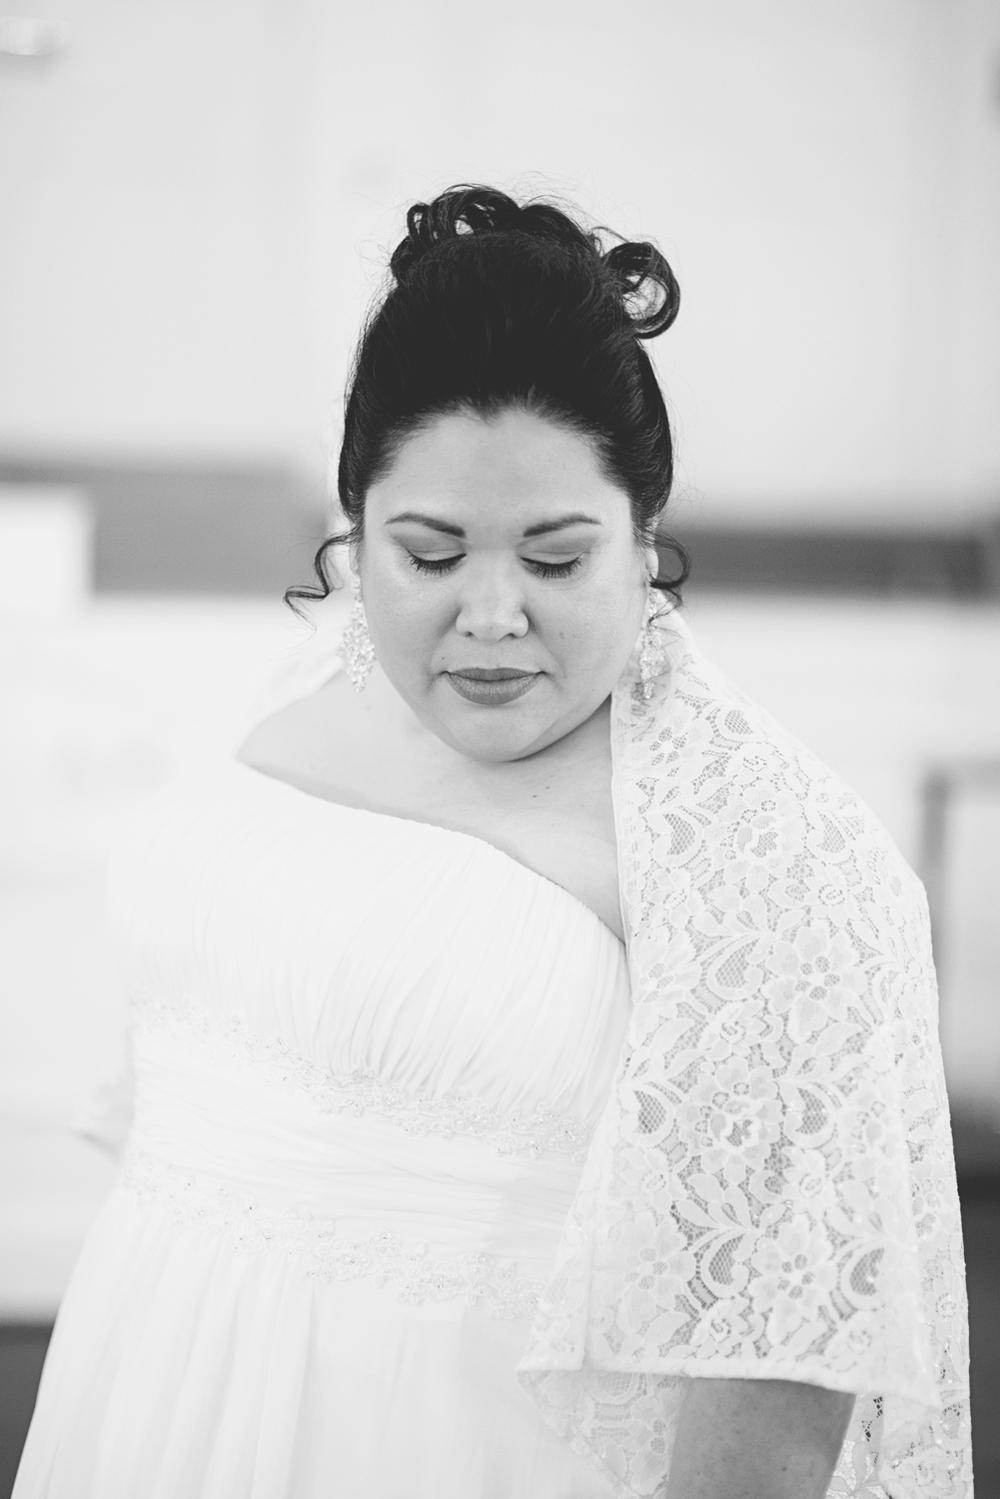 Bridal portraits | Church winter wedding | Black and white